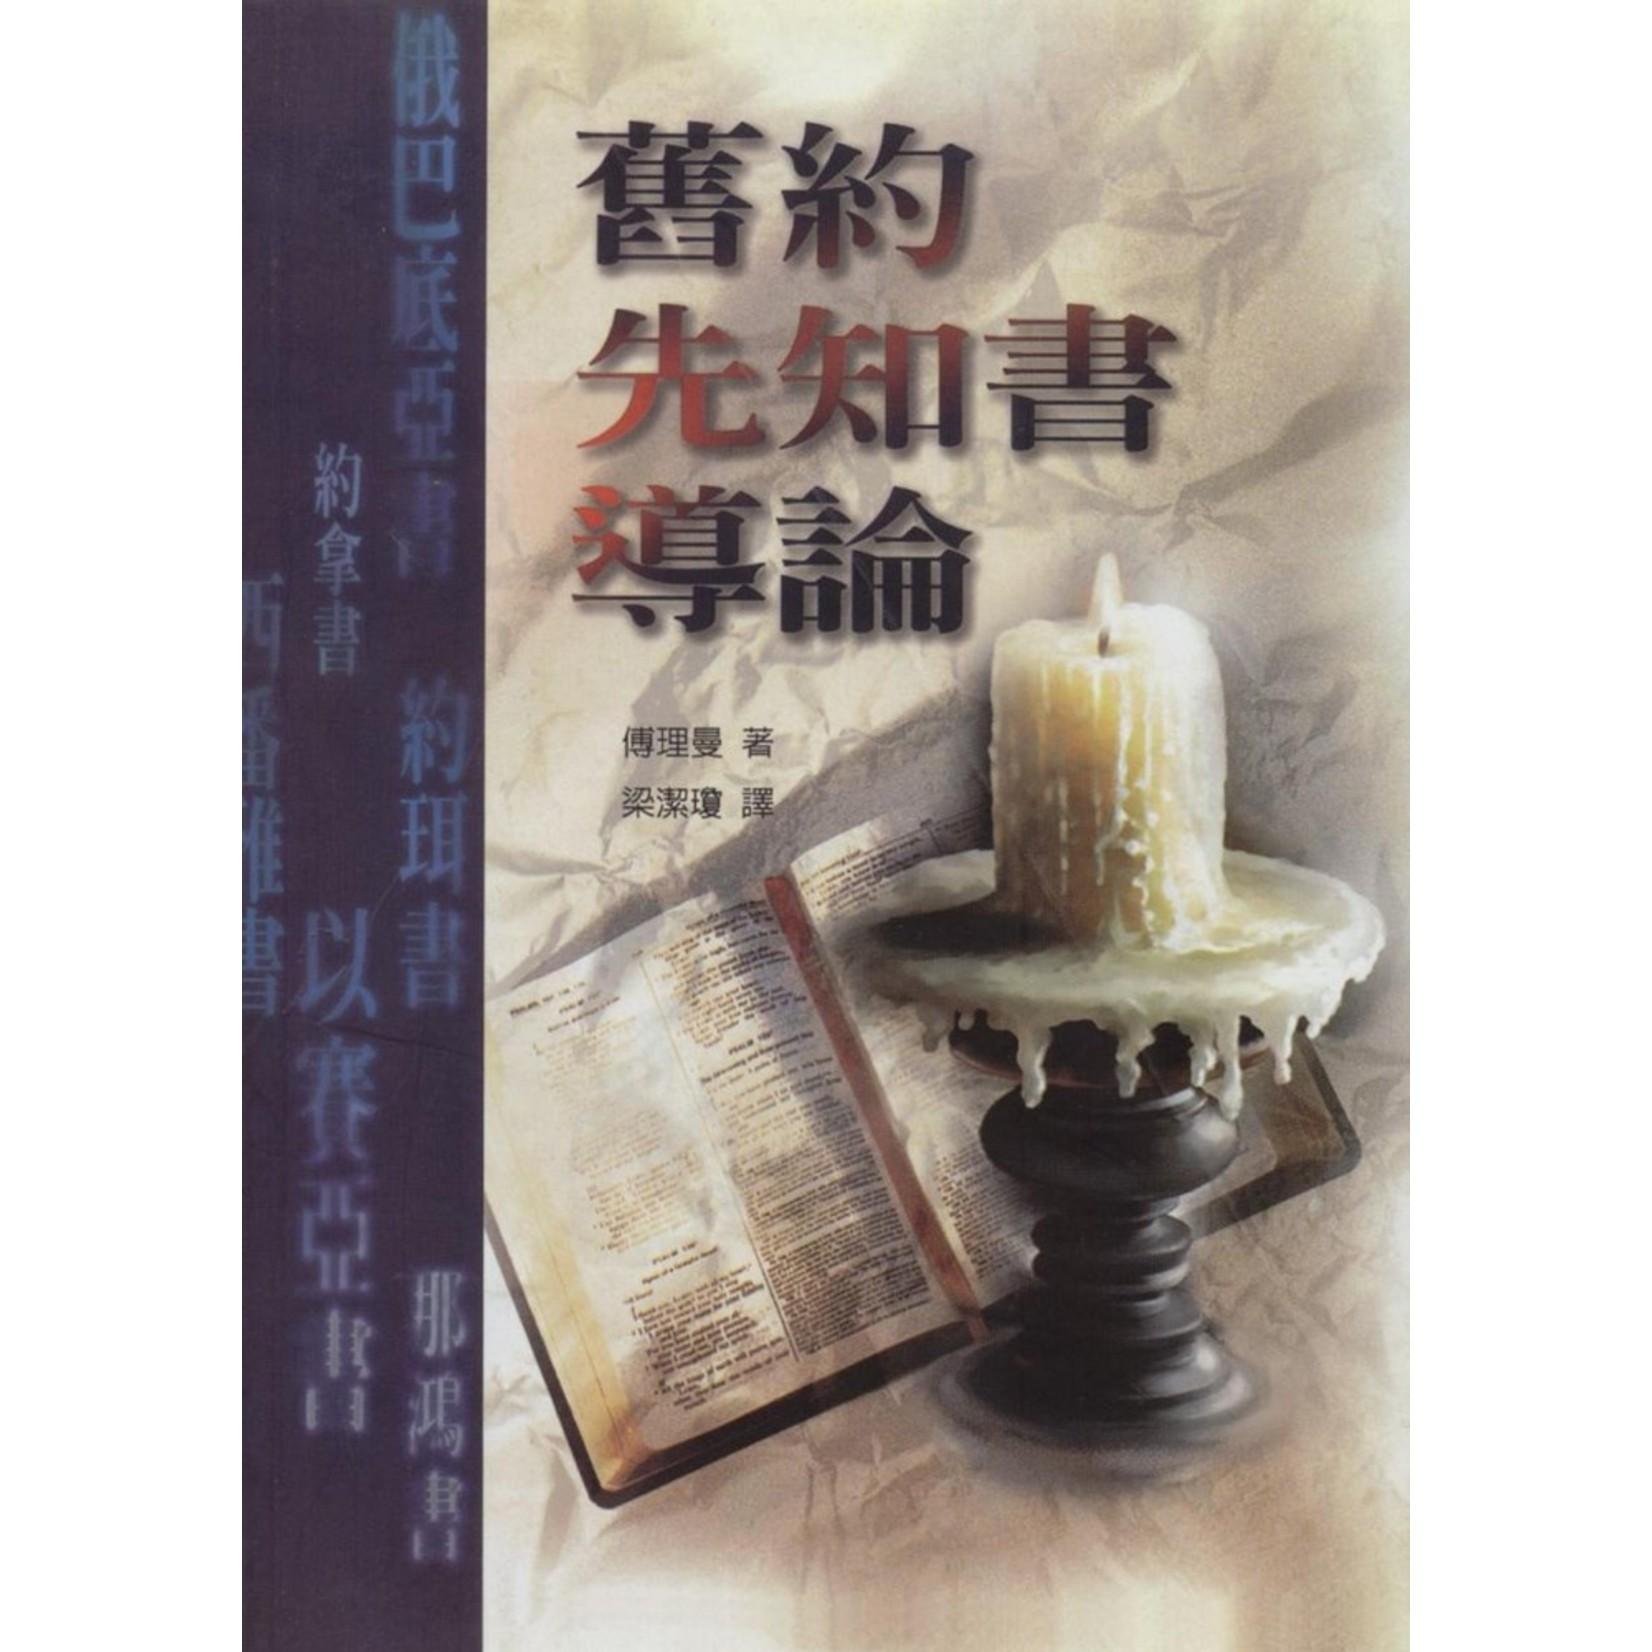 中華福音神學院 China Evangelical Seminary 舊約先知書導論 An Introduction to the Old Testament Prophets